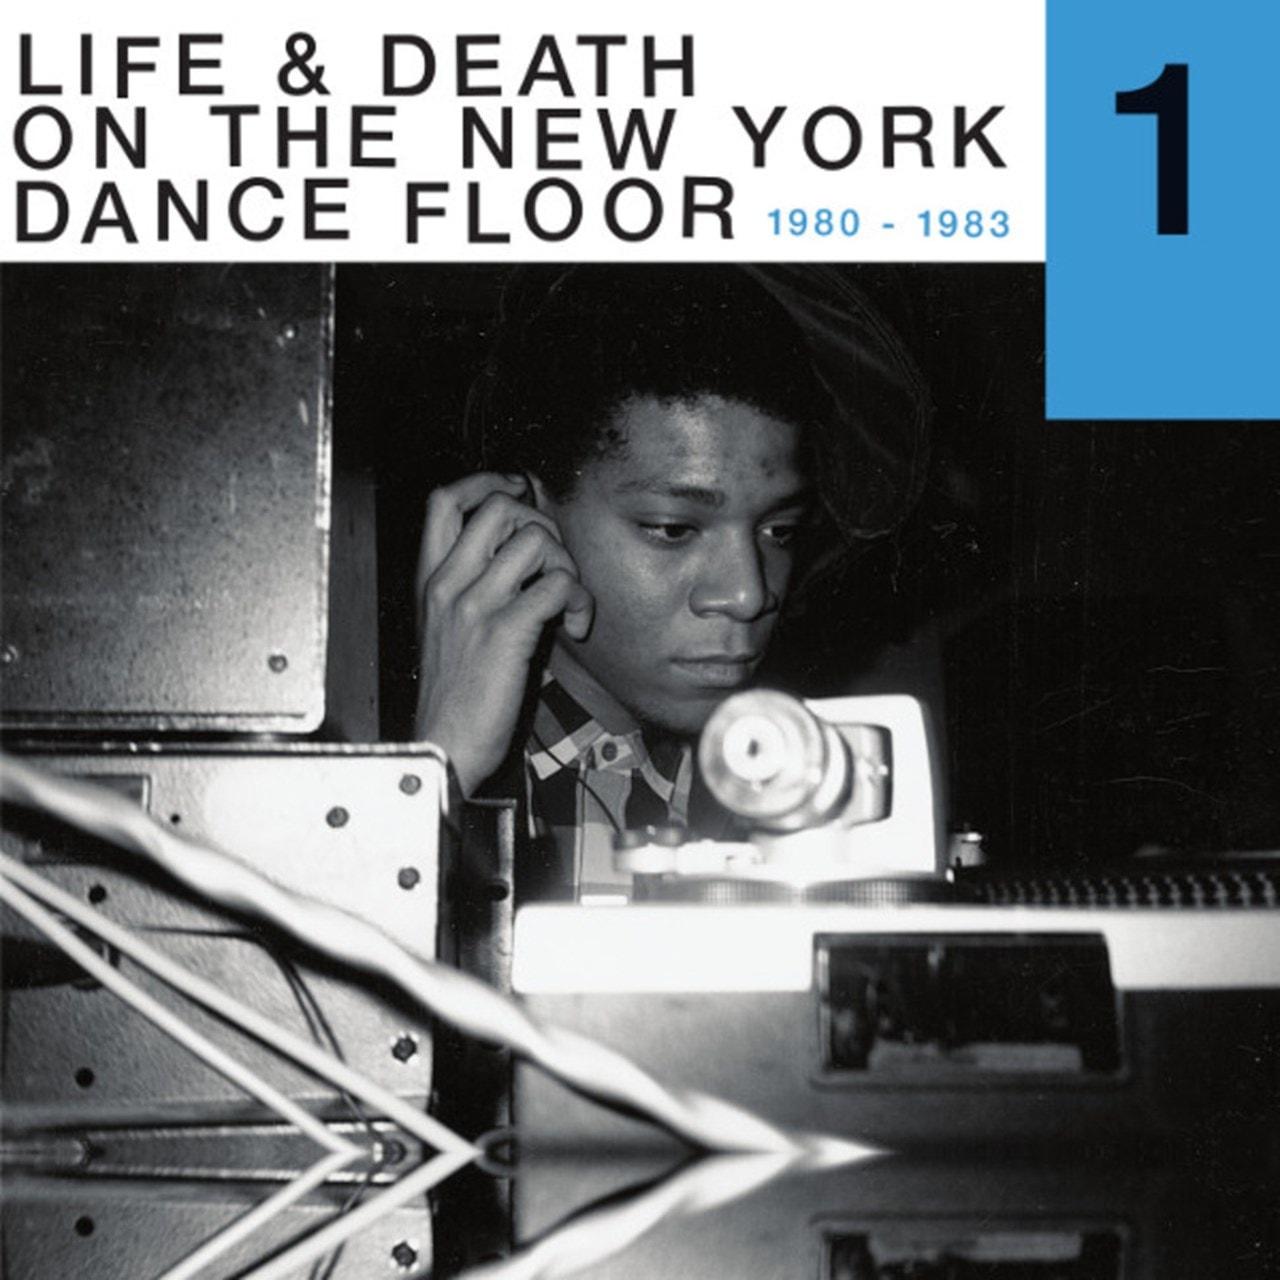 Life & Death On the New York Dance Floor - Part 1: 1980-1983 - 1